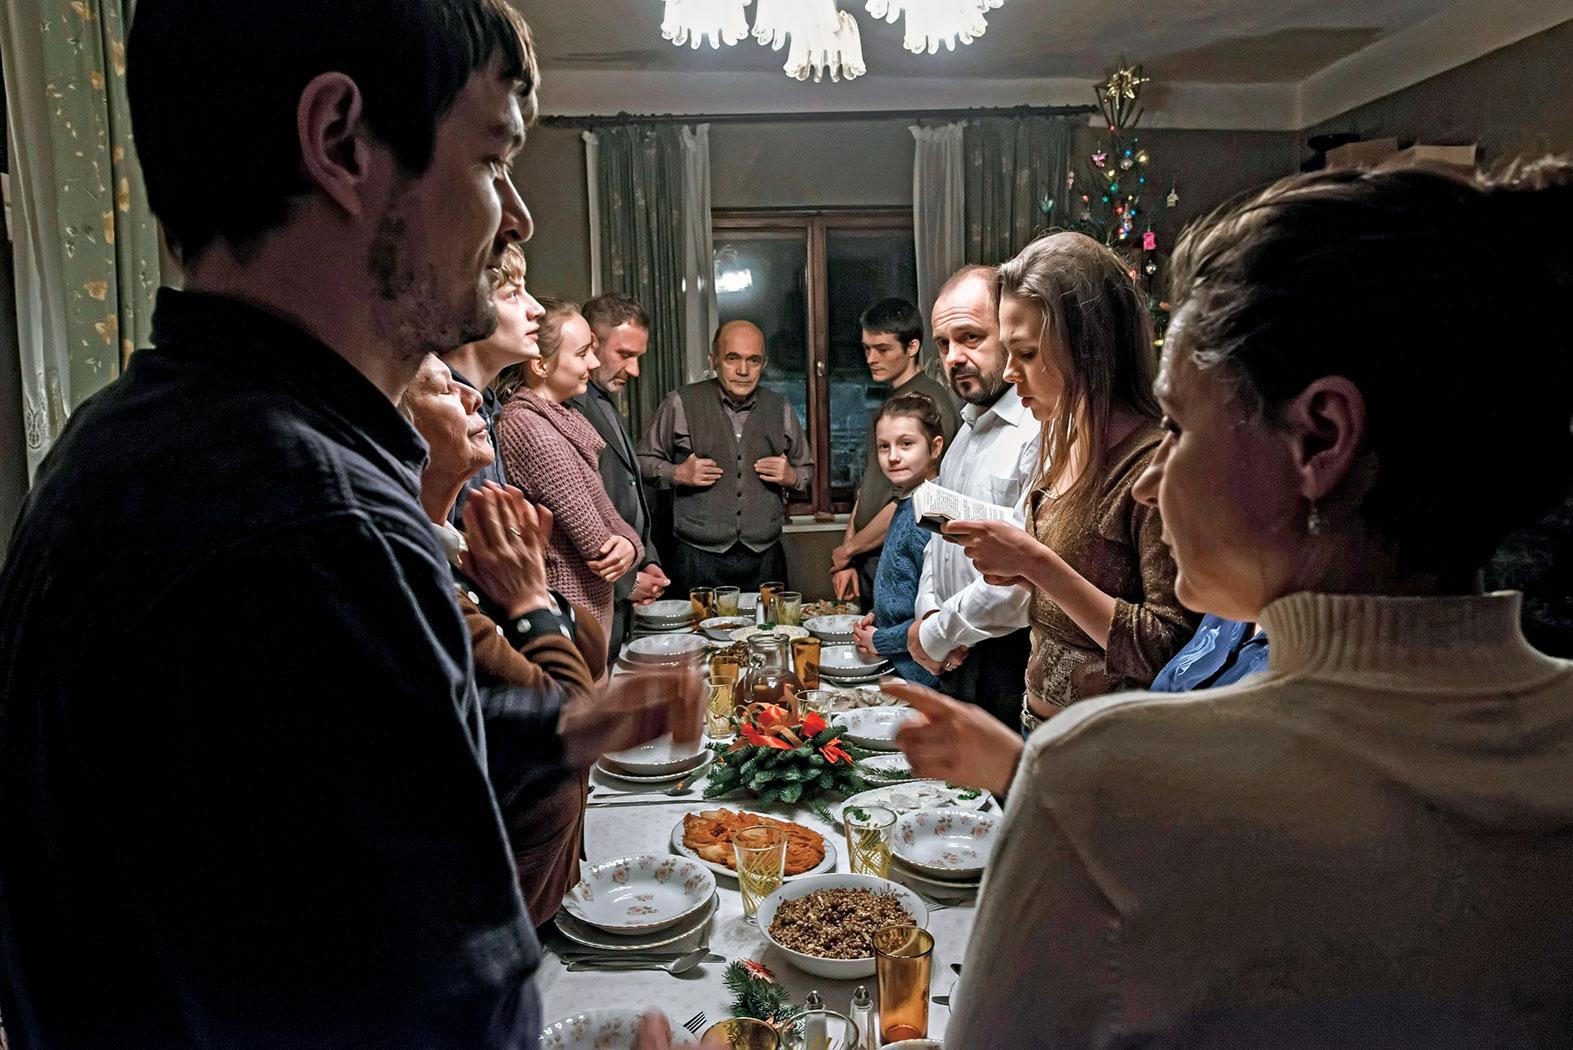 Powroty do domu – recenzja filmu <i>Cicha noc</i>